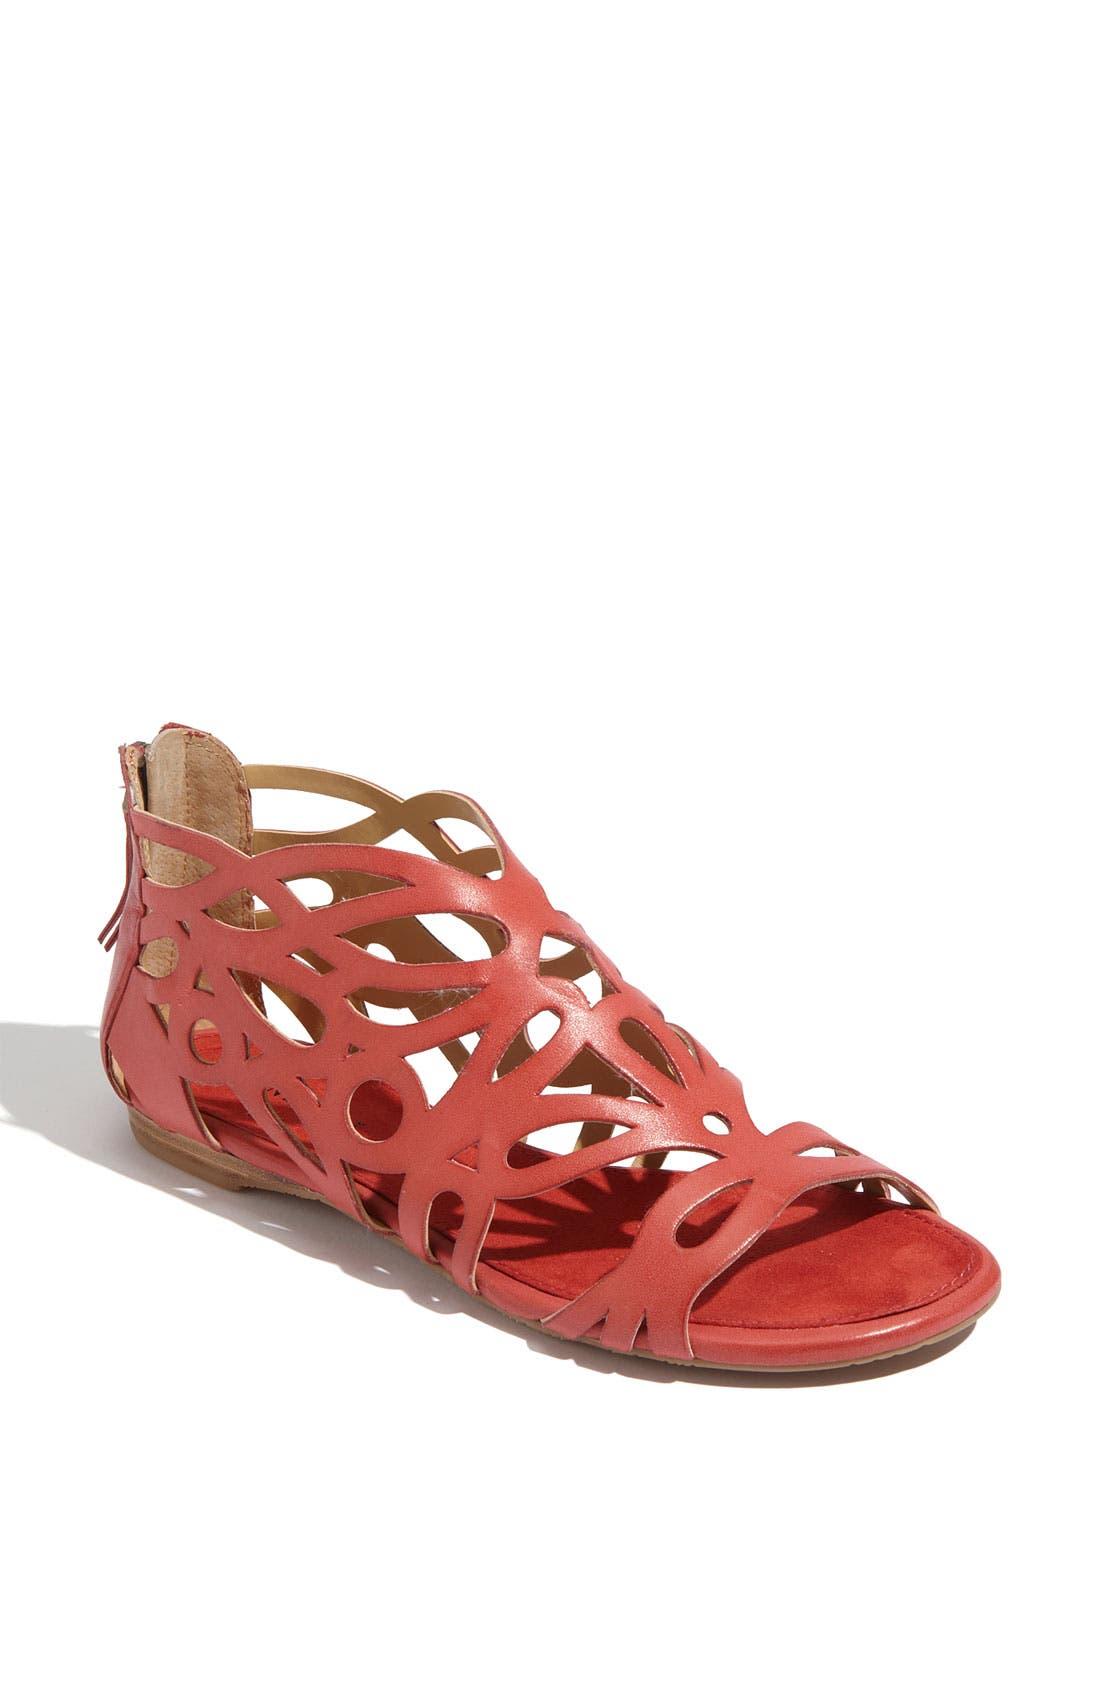 'Tali' Sandal,                             Main thumbnail 1, color,                             Red Leather